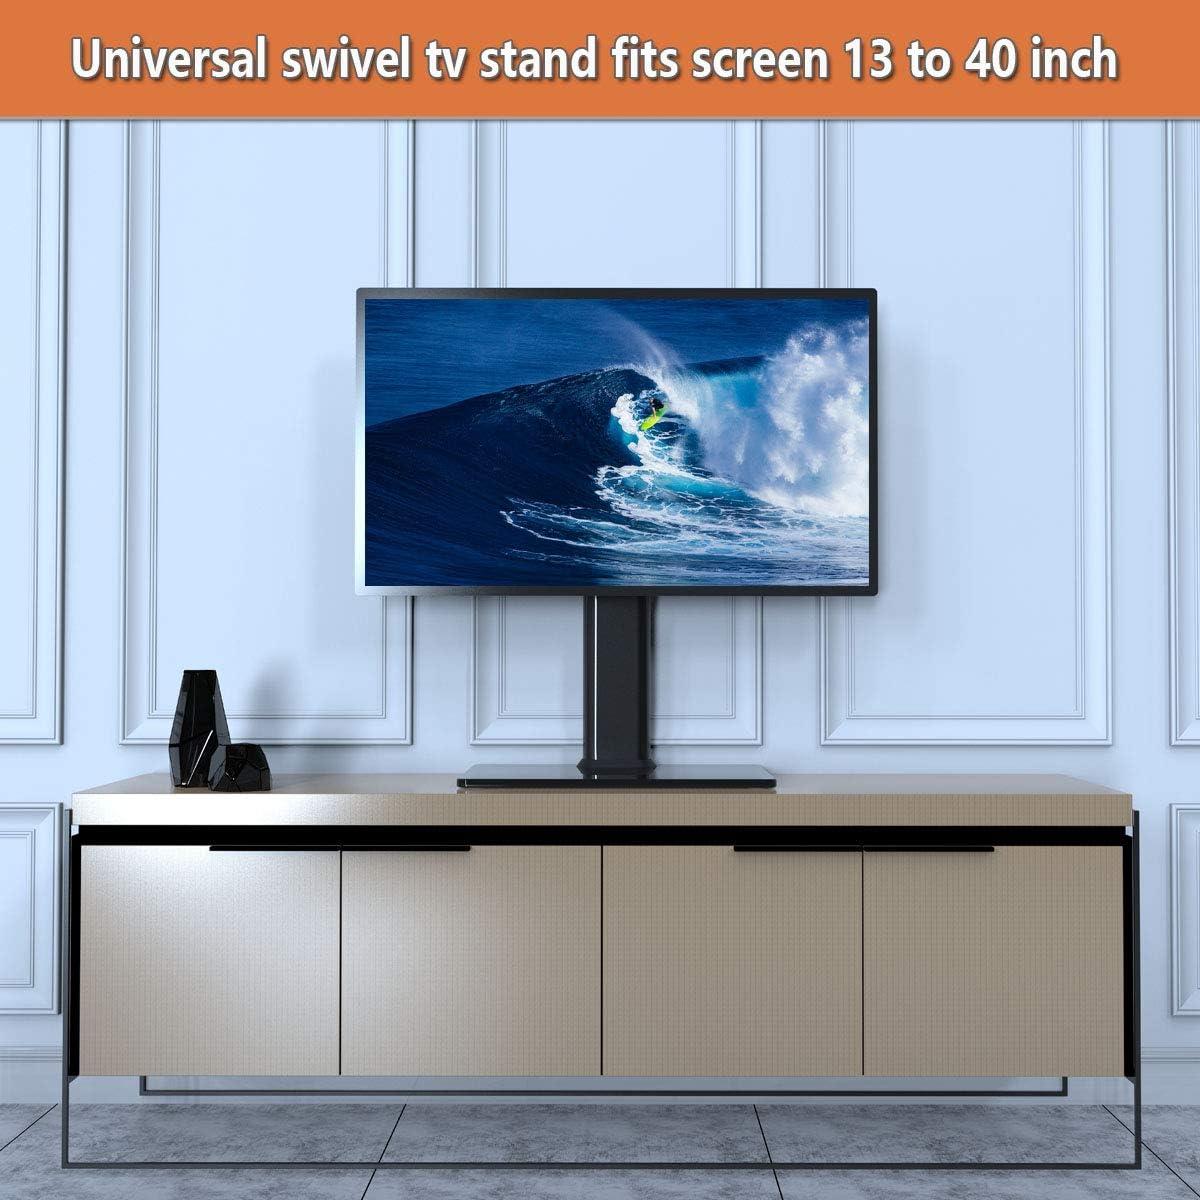 Soporte de TV giratorio universal / base de mesa Soporte de TV para televisores de 19 a 39 pulgadas con giratorio de 100 grados, altura ajustable de 4 niveles,capacidad hasta 35kgs: Amazon.es: Electrónica